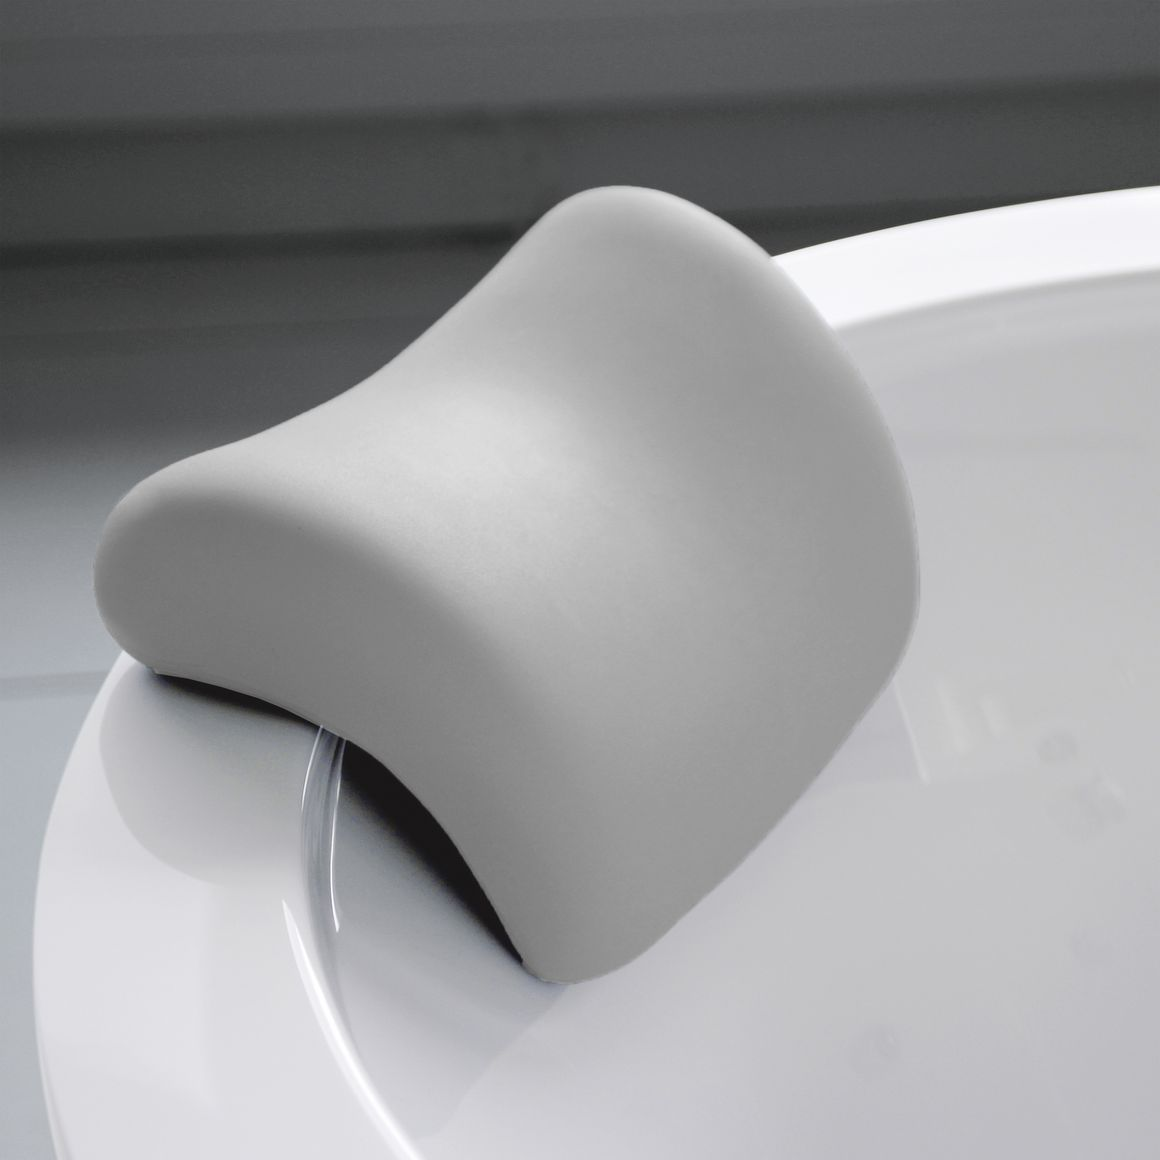 Cuscino per vasca da bagno modelli prezzi ed offerte online - Vasca da bagno ikea ...